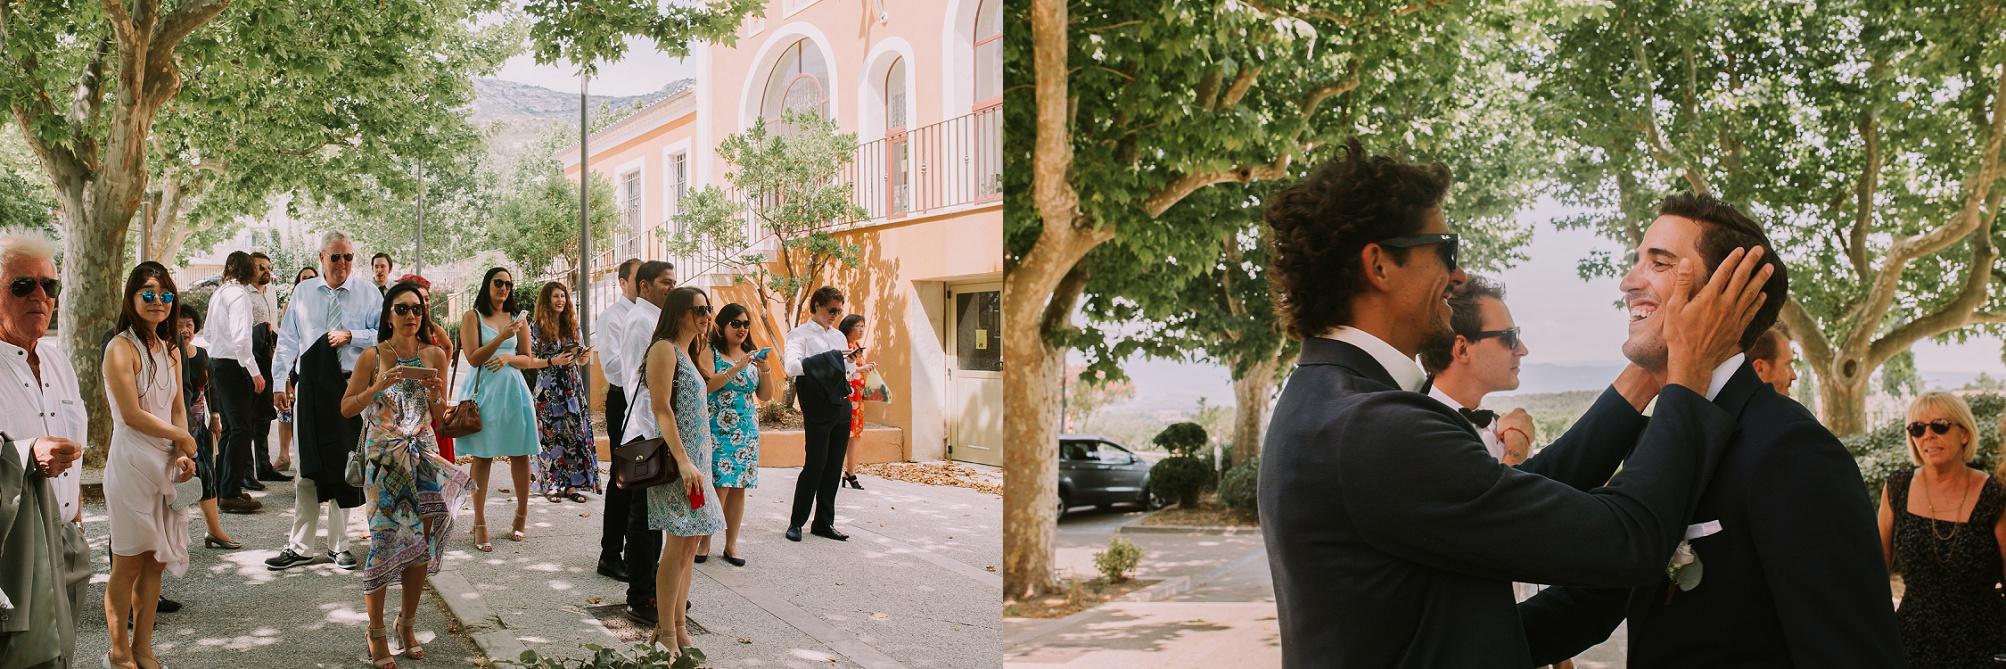 katerynaphotos-mariage-photographe-puyloubier-provence-aix-en-provence-sud-de-la-france_0345.jpg